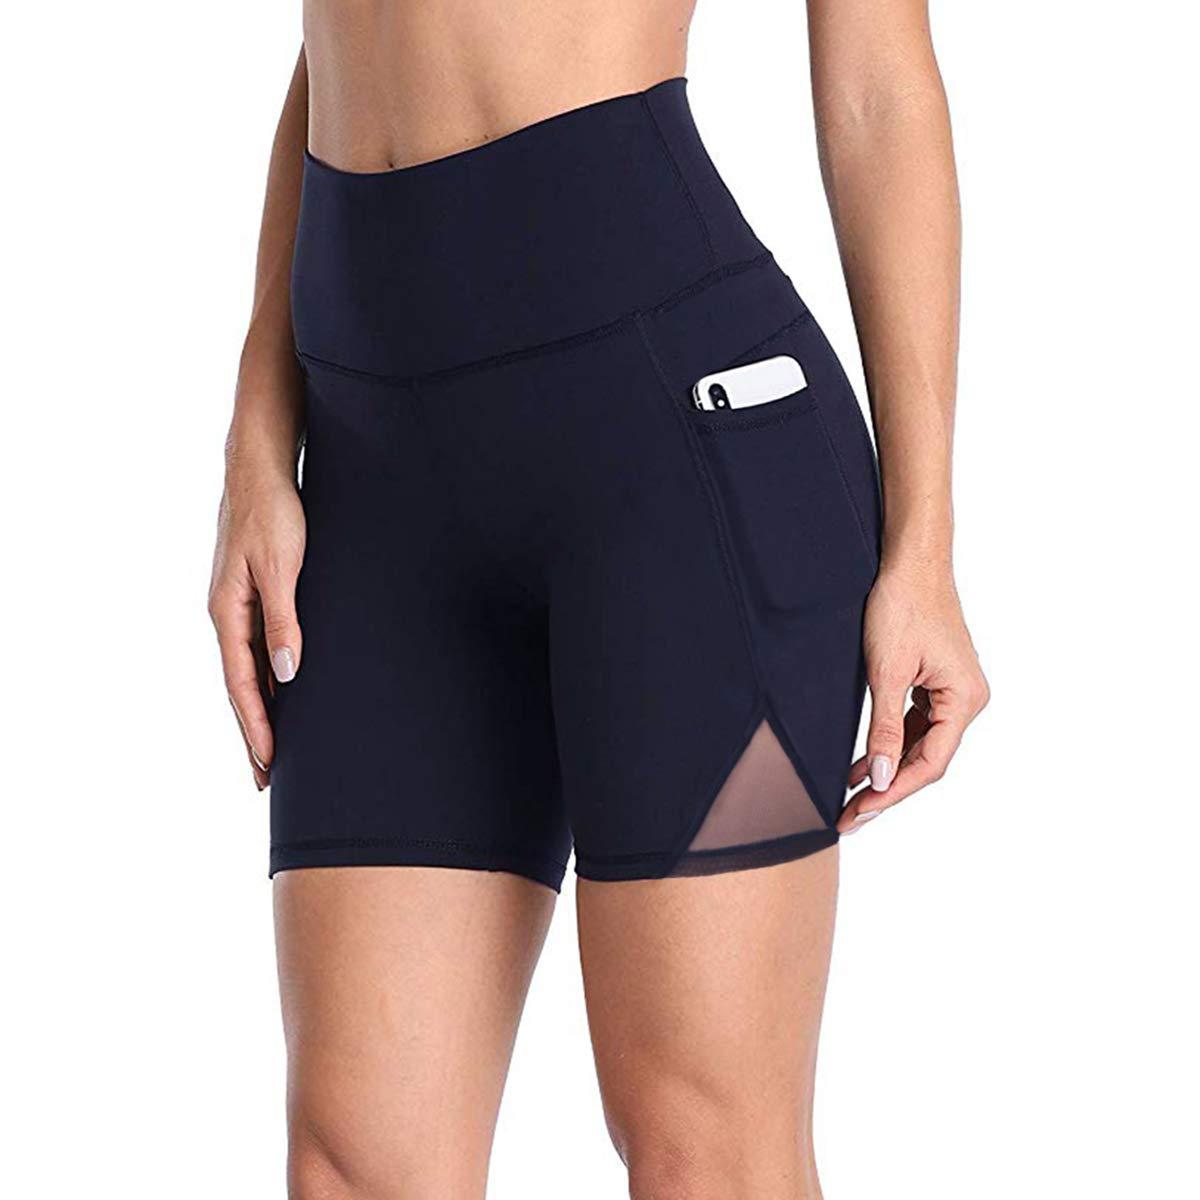 DILANNI Yoga Shorts for Women High Waist Pockets Yoga Bike Workout Shorts(Navy Blue XS)